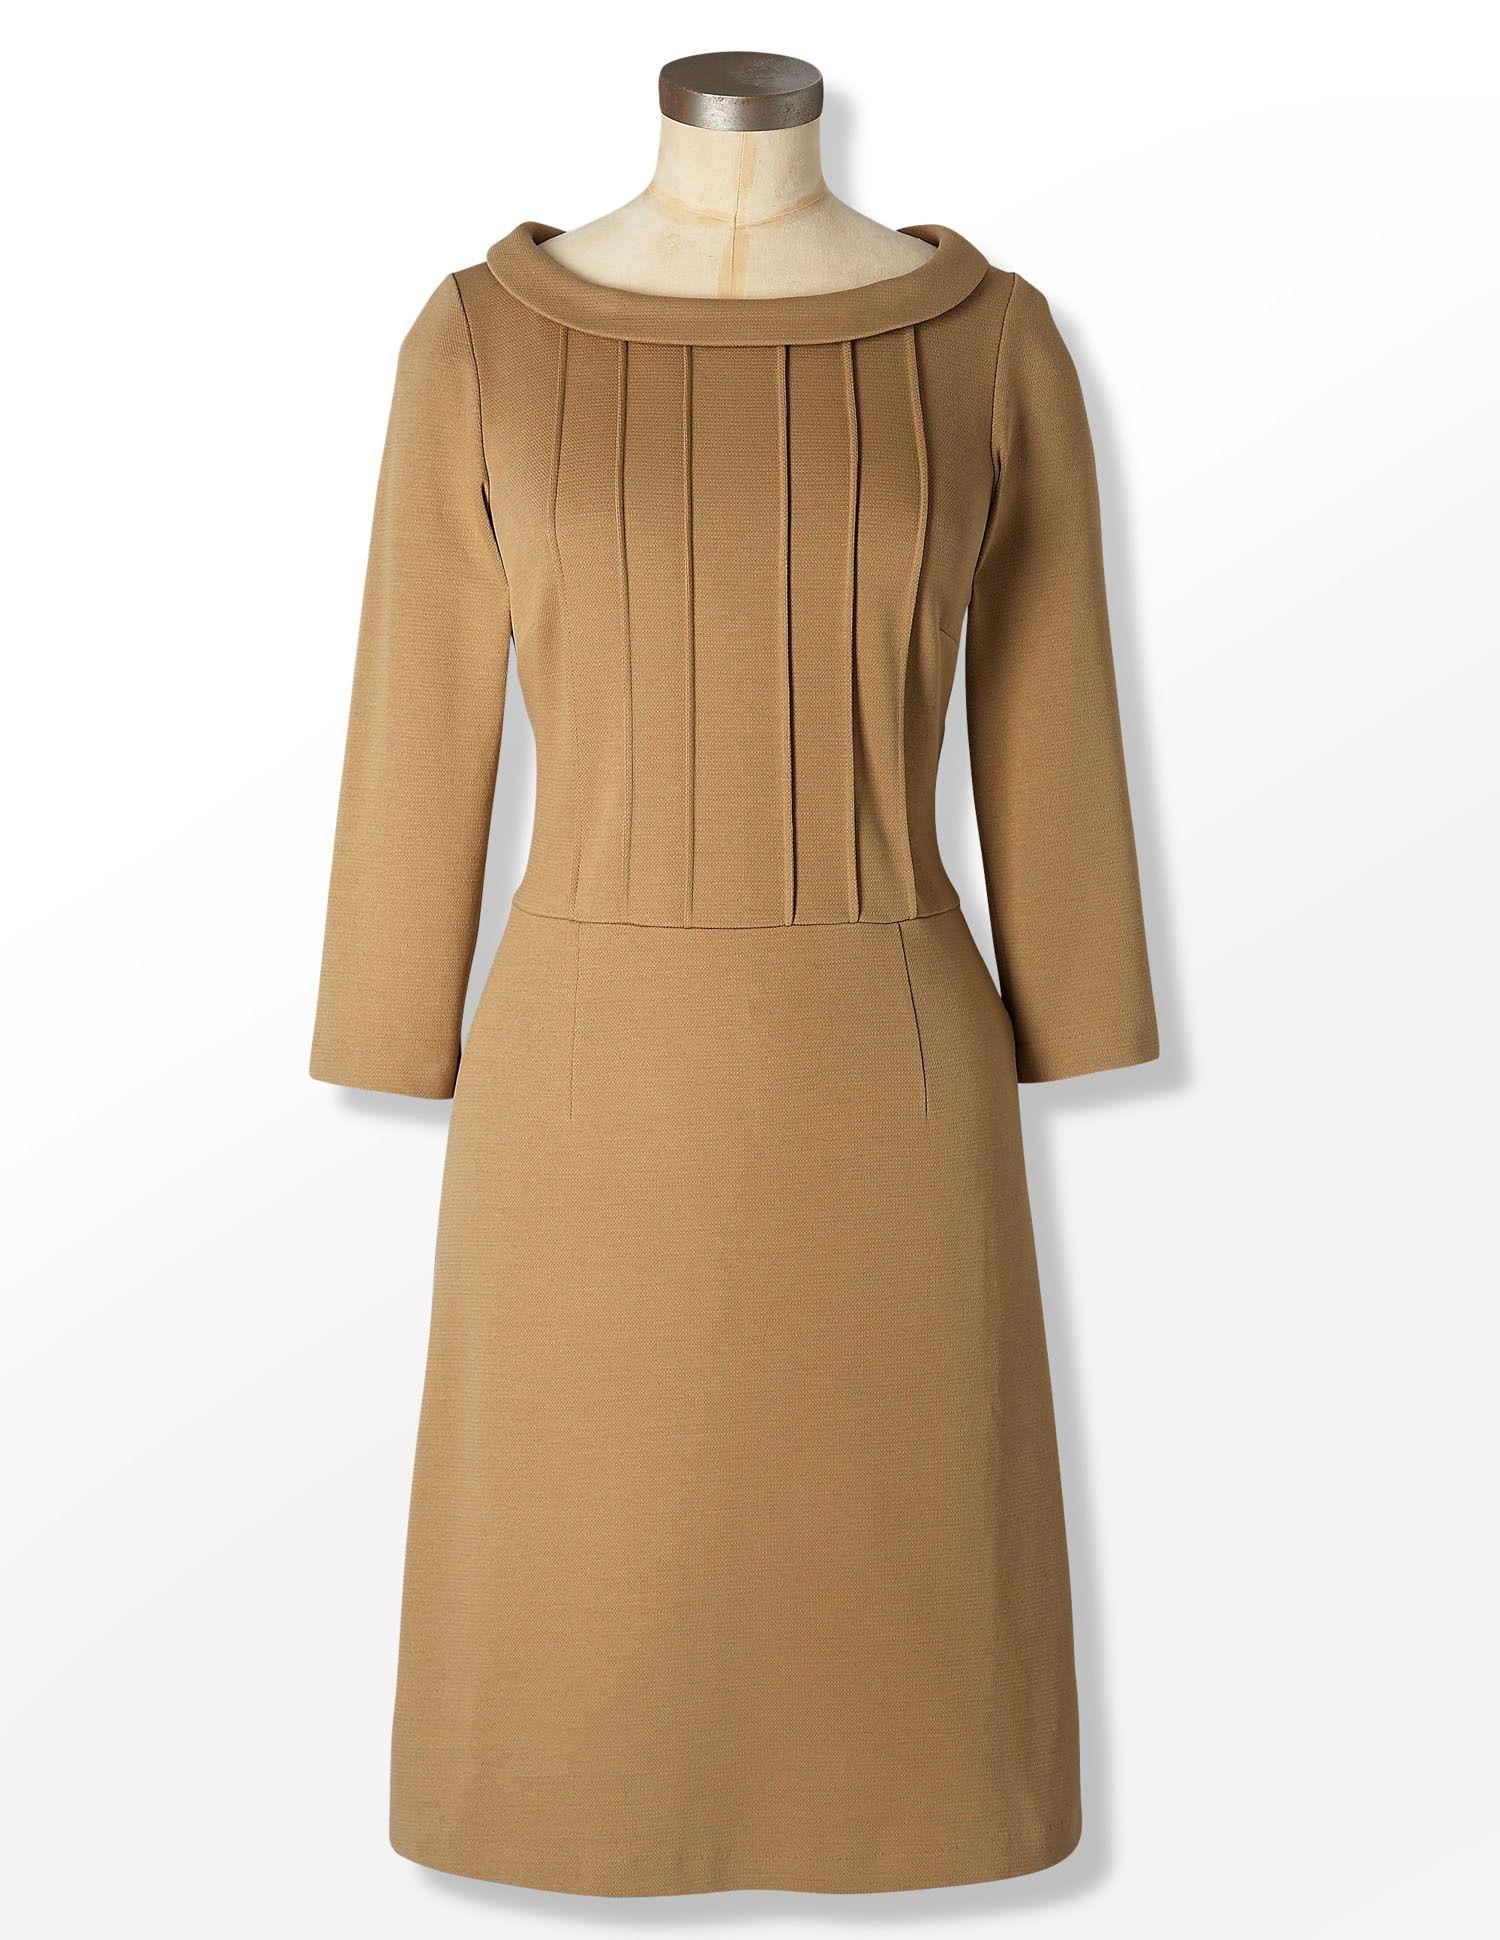 Alexa Dress Boden F A S H I O N S T Y L E Dresses